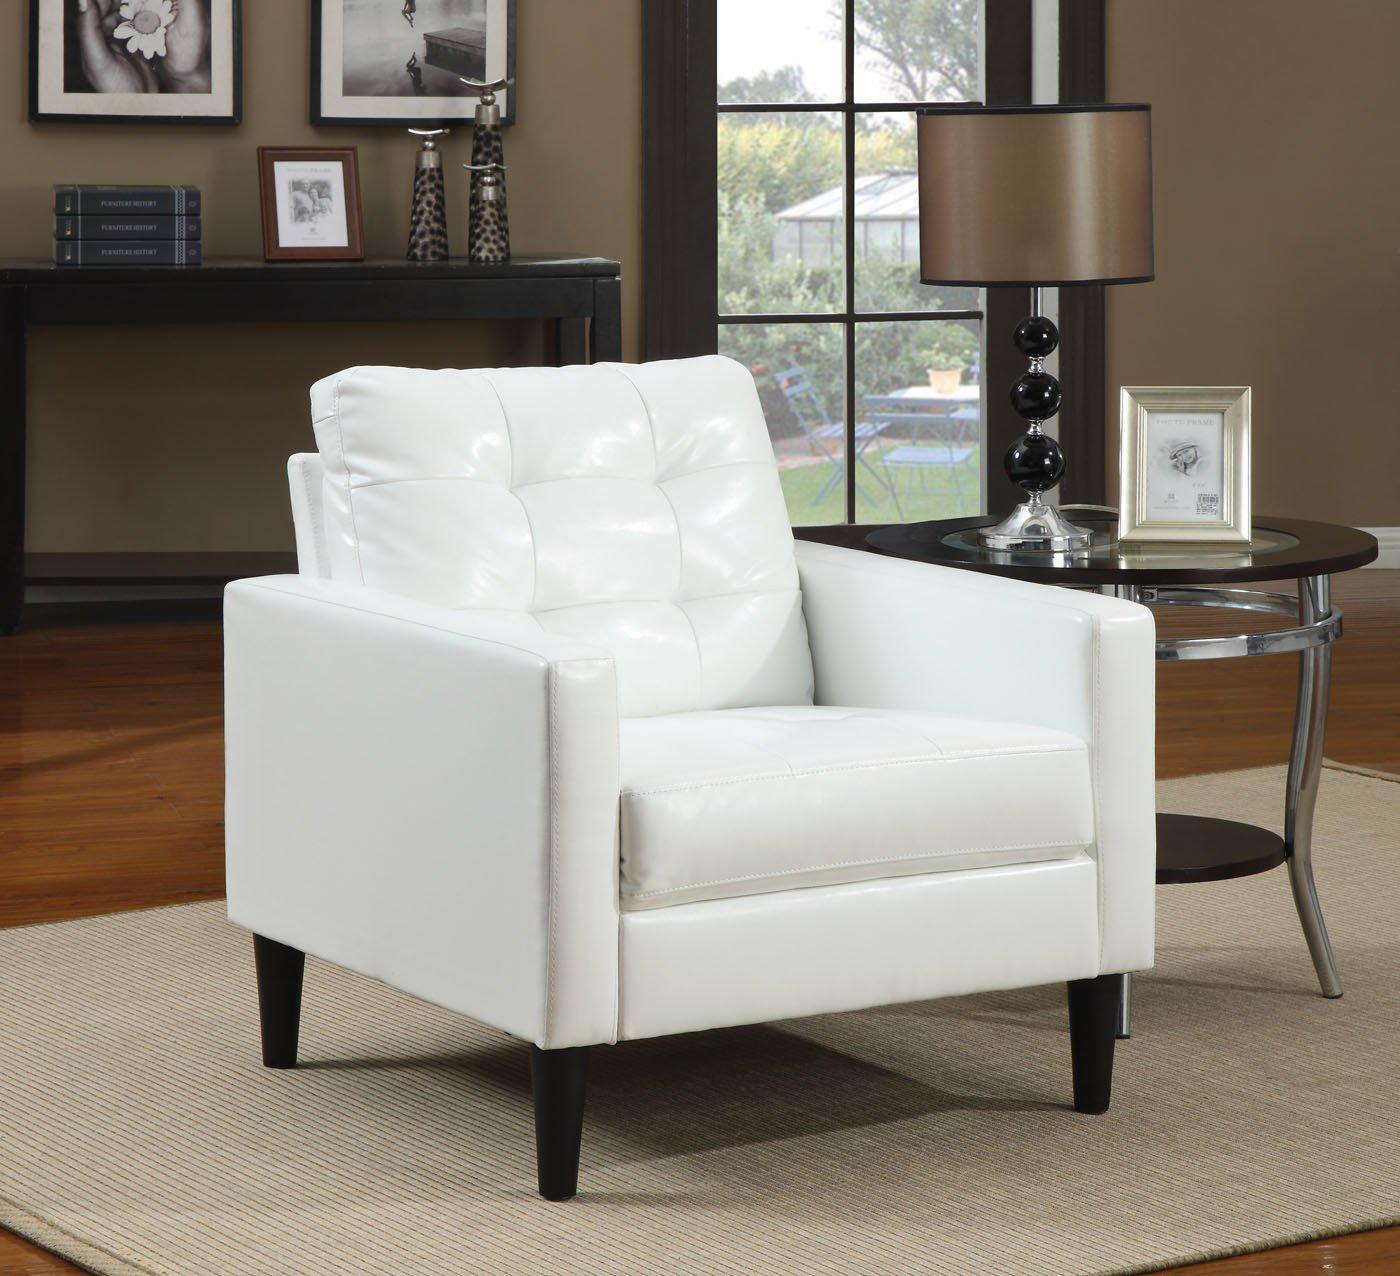 Sofa Chair Armchairs Leisure Furniture Soft Chair Leather Chair Lounge Chairs Modern Chair Lover Sofa Swivel Chairs Living Room Chair Uk 2019